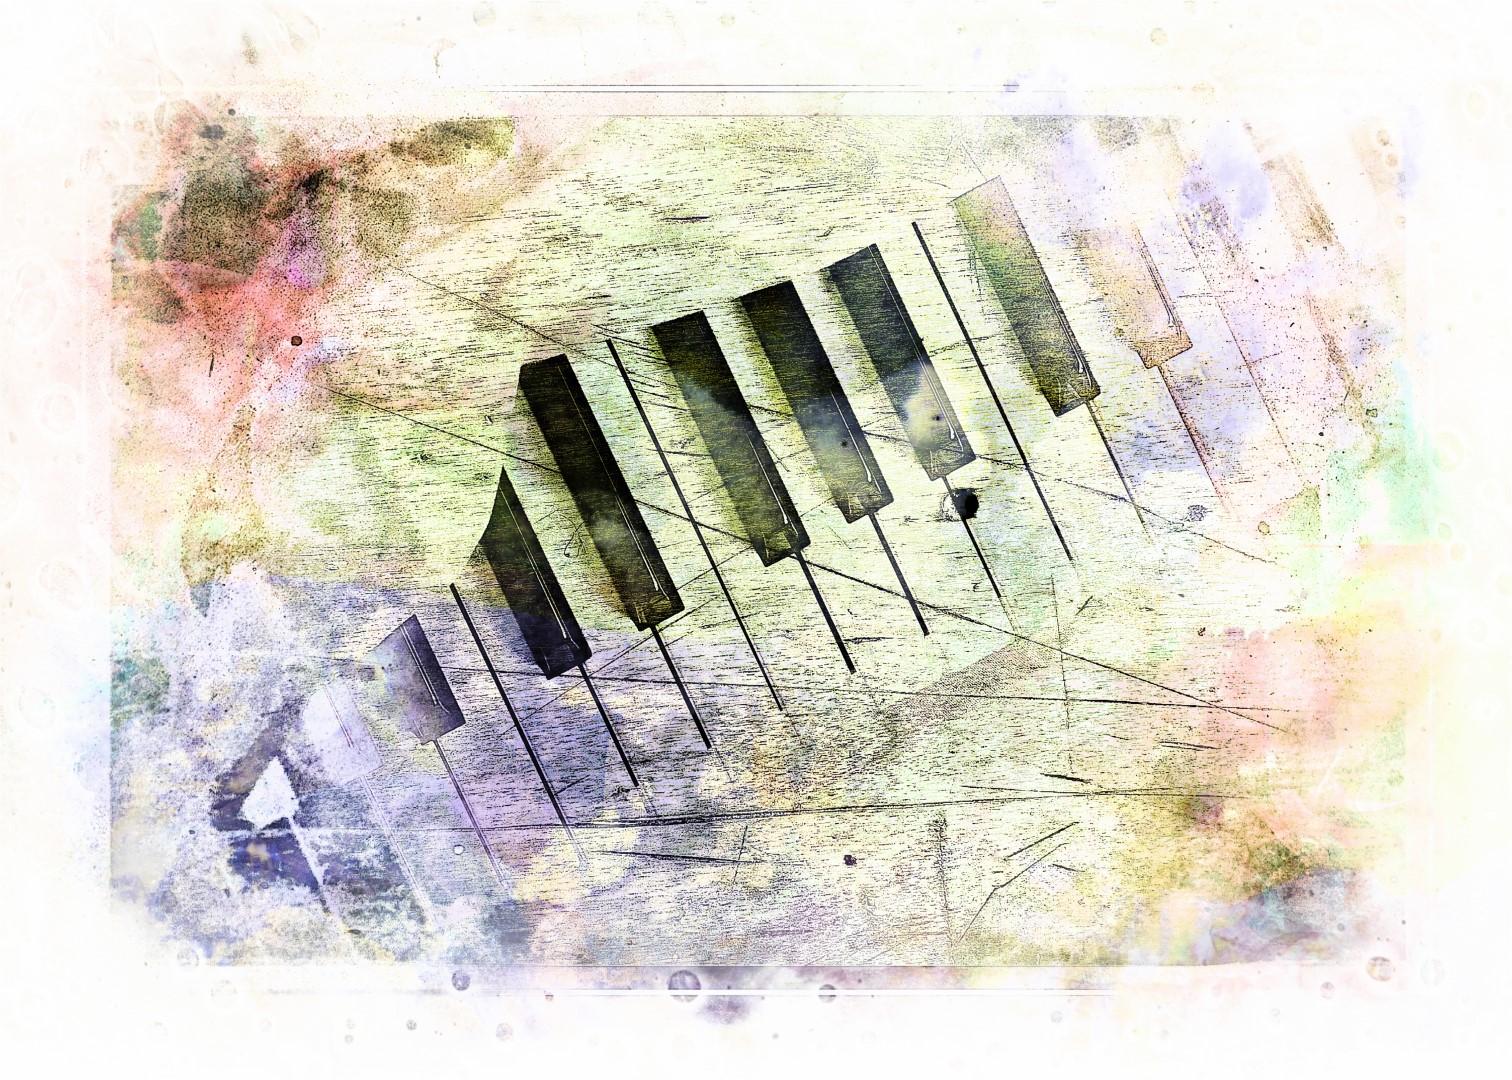 7036729-piano_2jpg (Large)